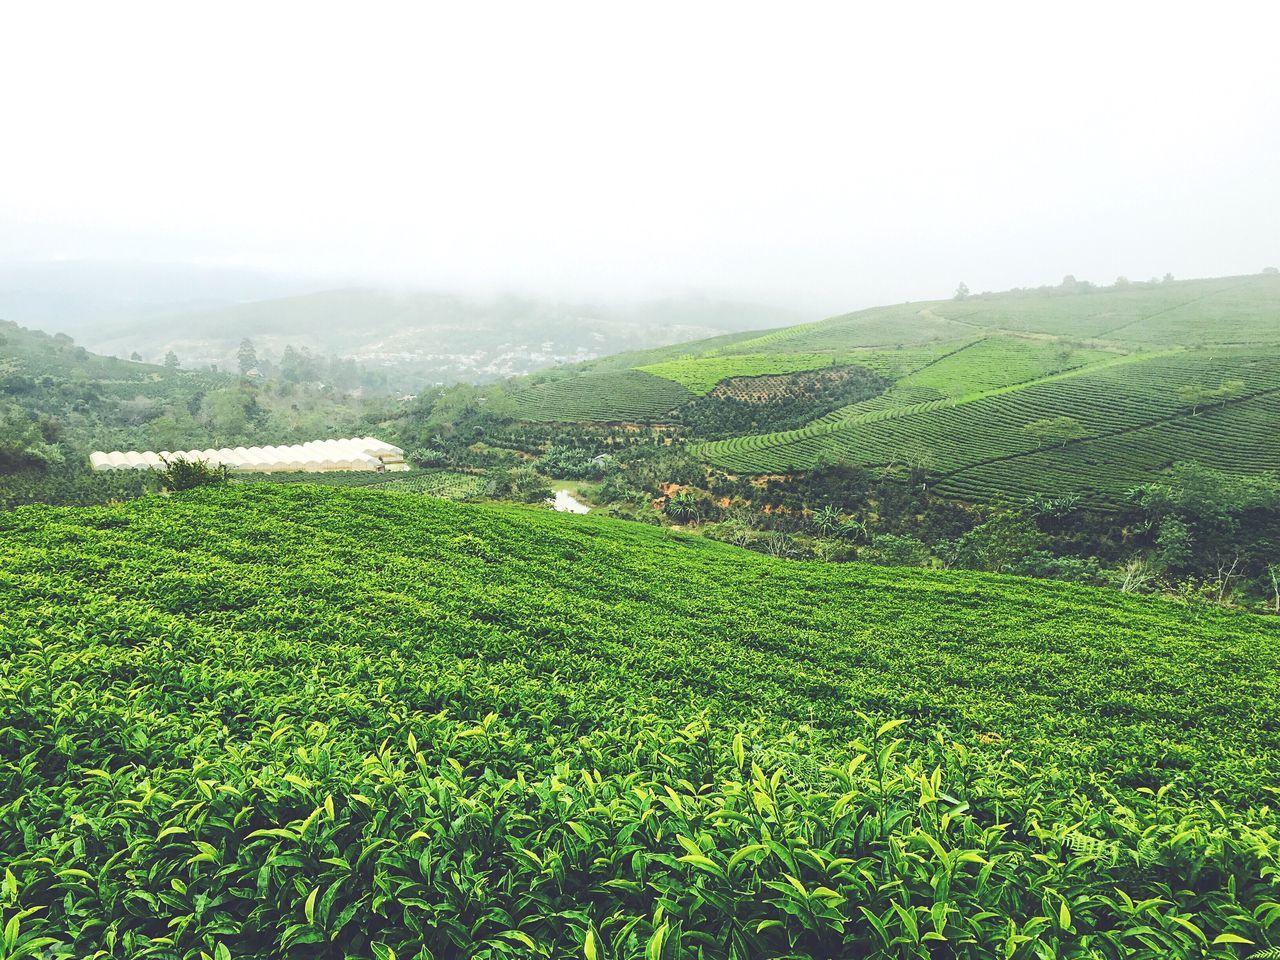 Cau Dat tea hill Dalat Vietnam Hills Leaves Trees Greenhouse Lake The Broad Life Thebroadlife